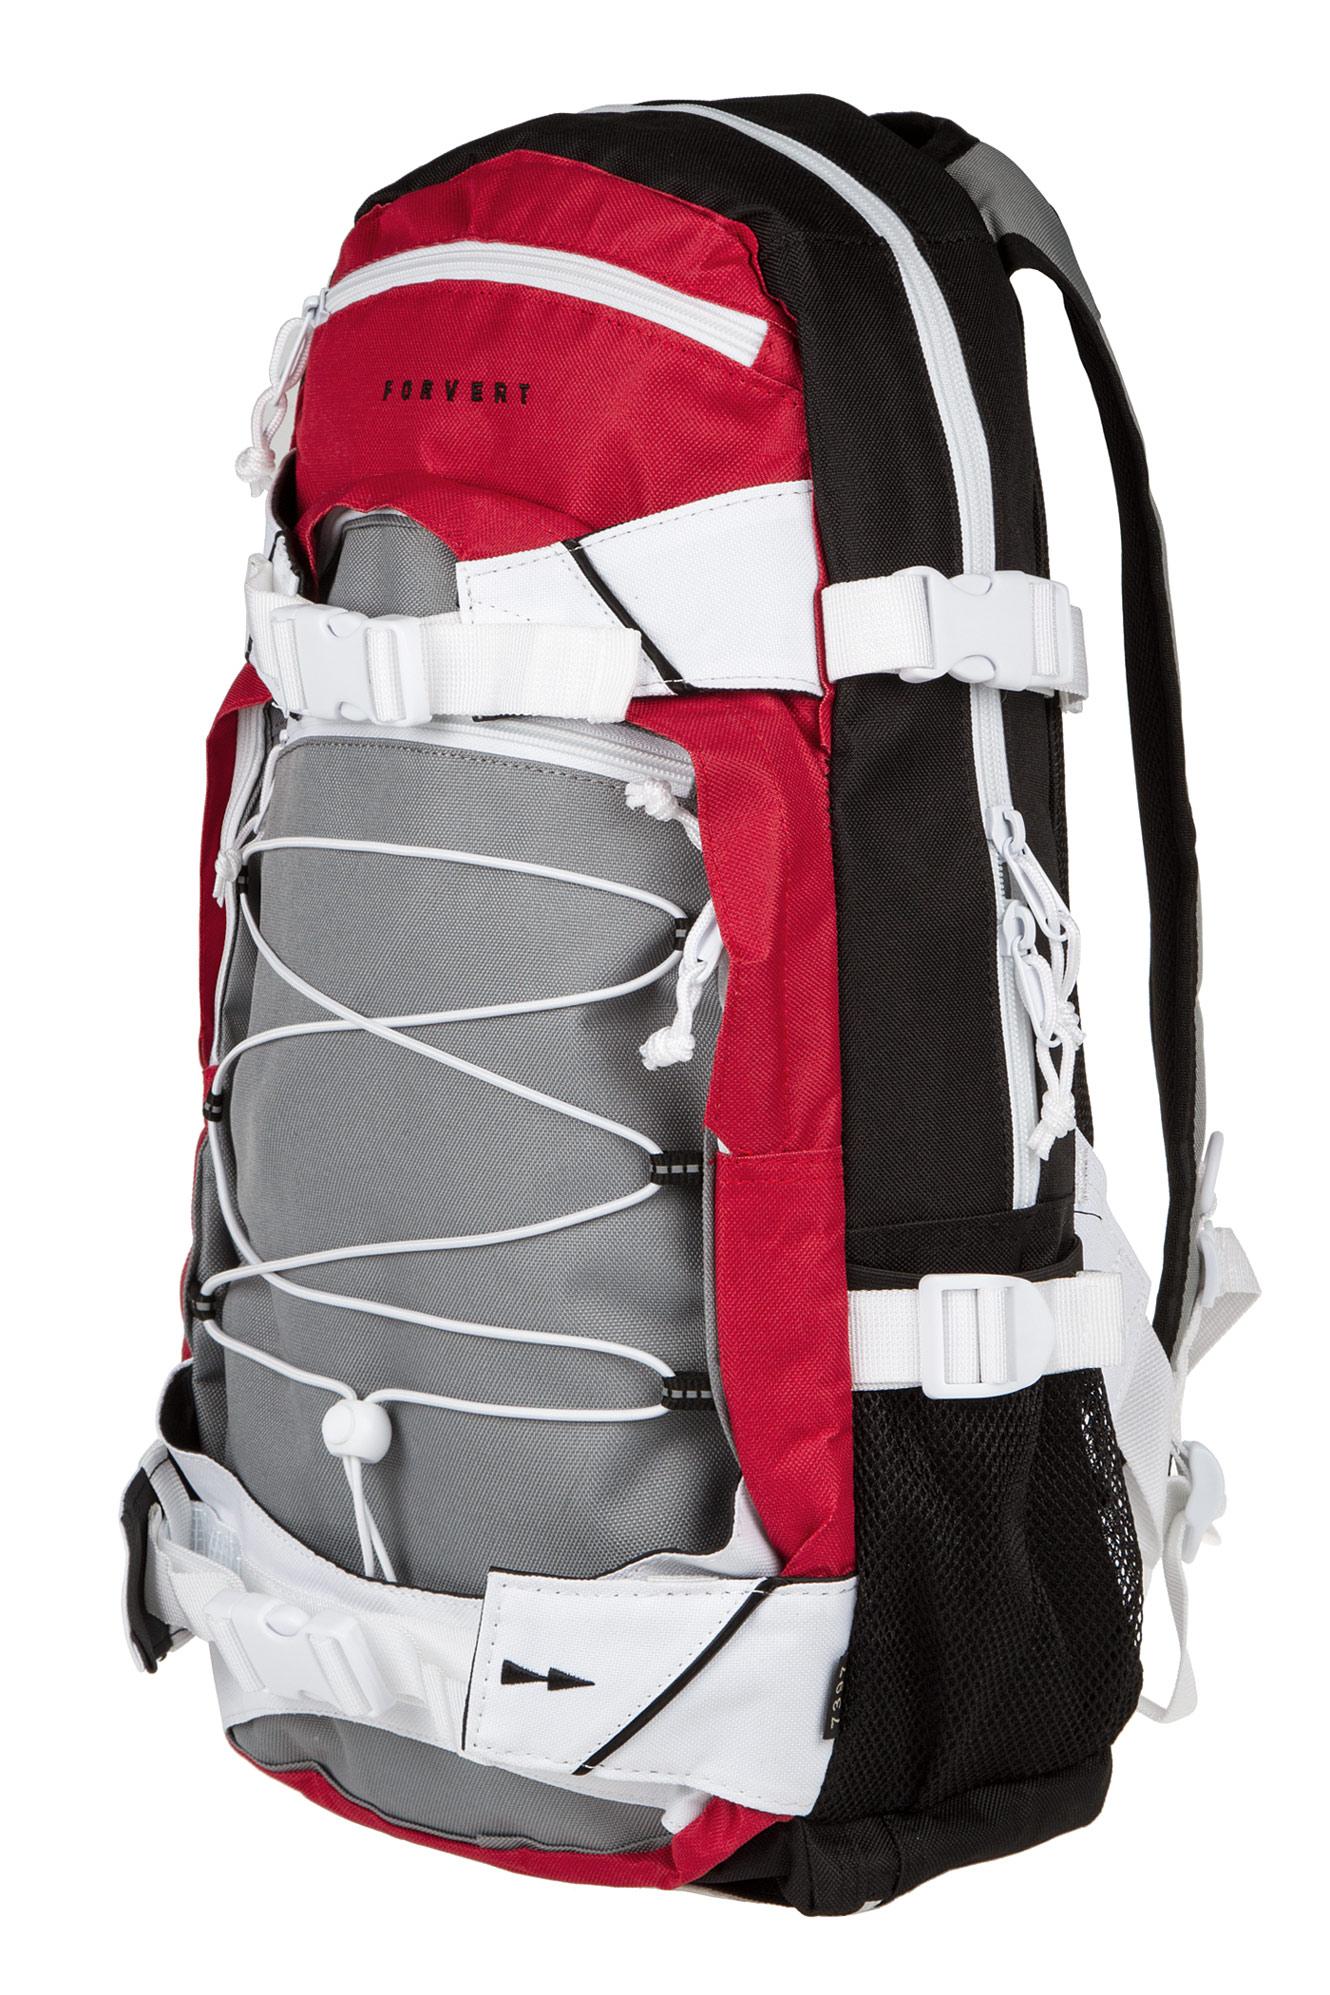 forvert ice louis mochila 20l multicolour xi comprar en. Black Bedroom Furniture Sets. Home Design Ideas